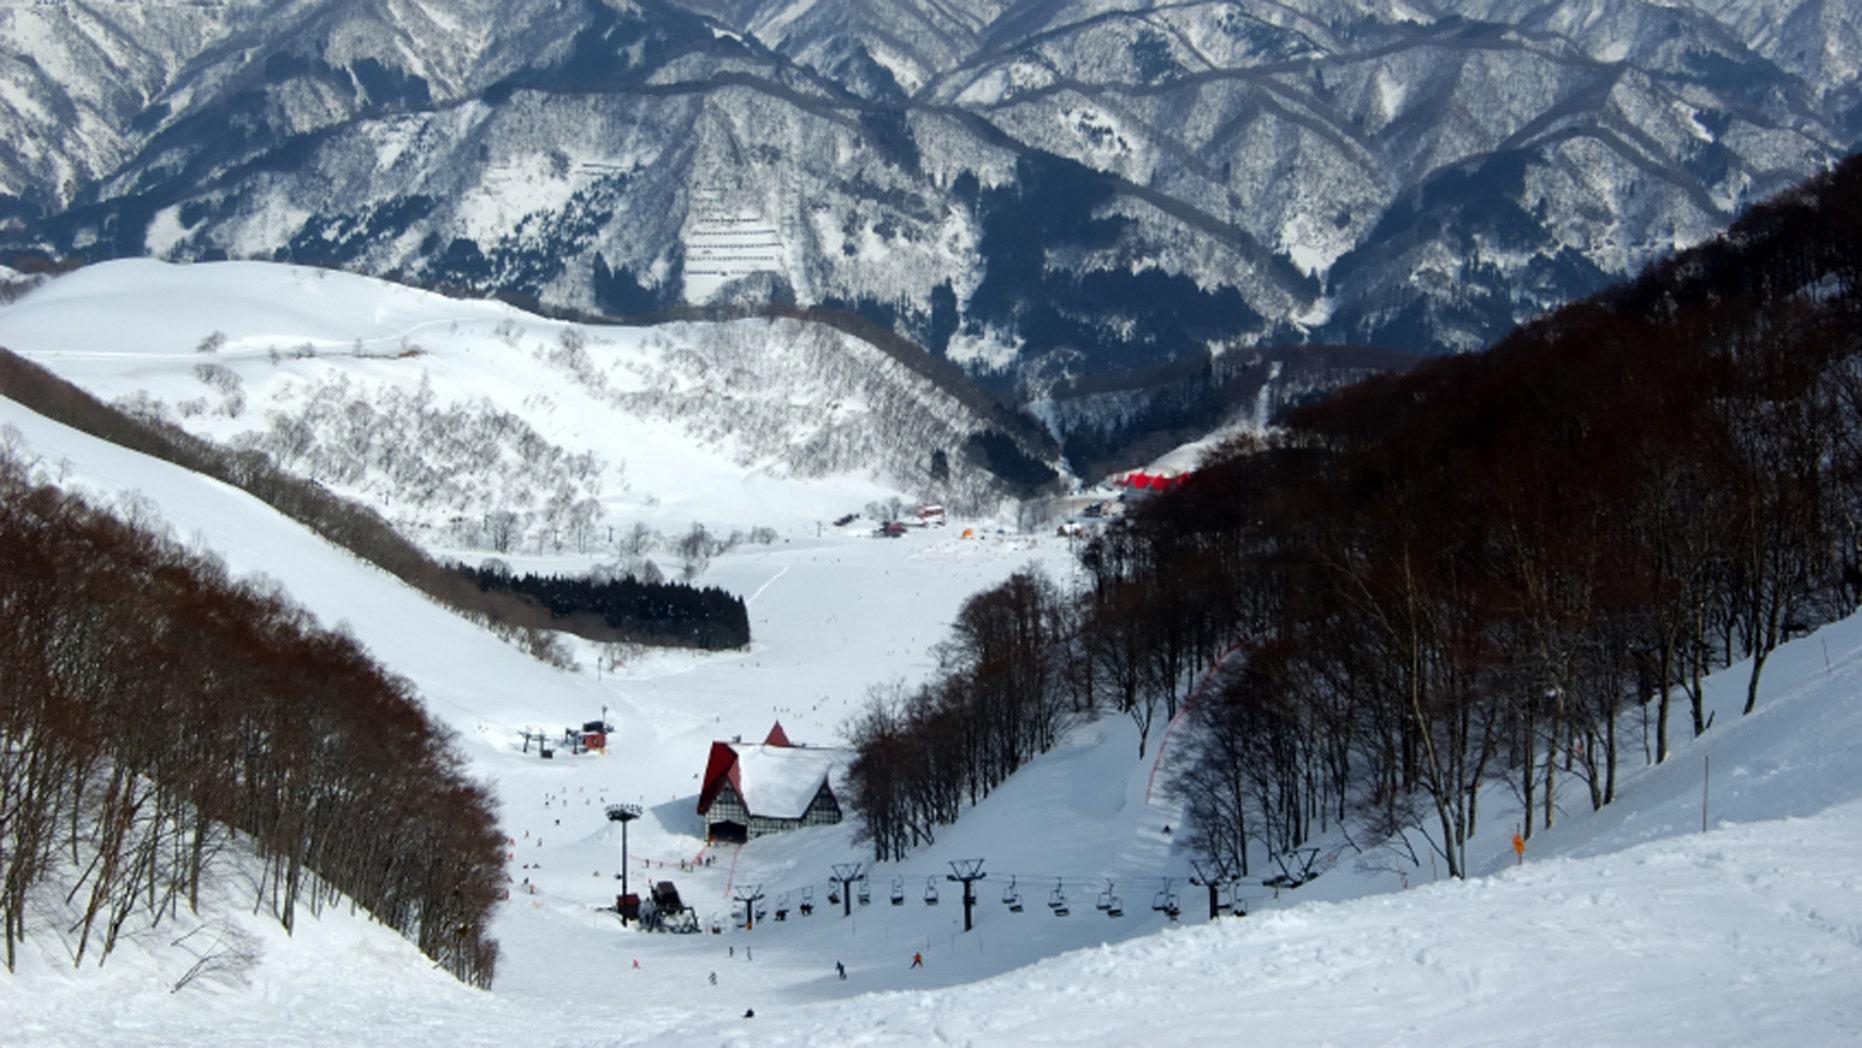 Ski slopes in the Japanese alpes